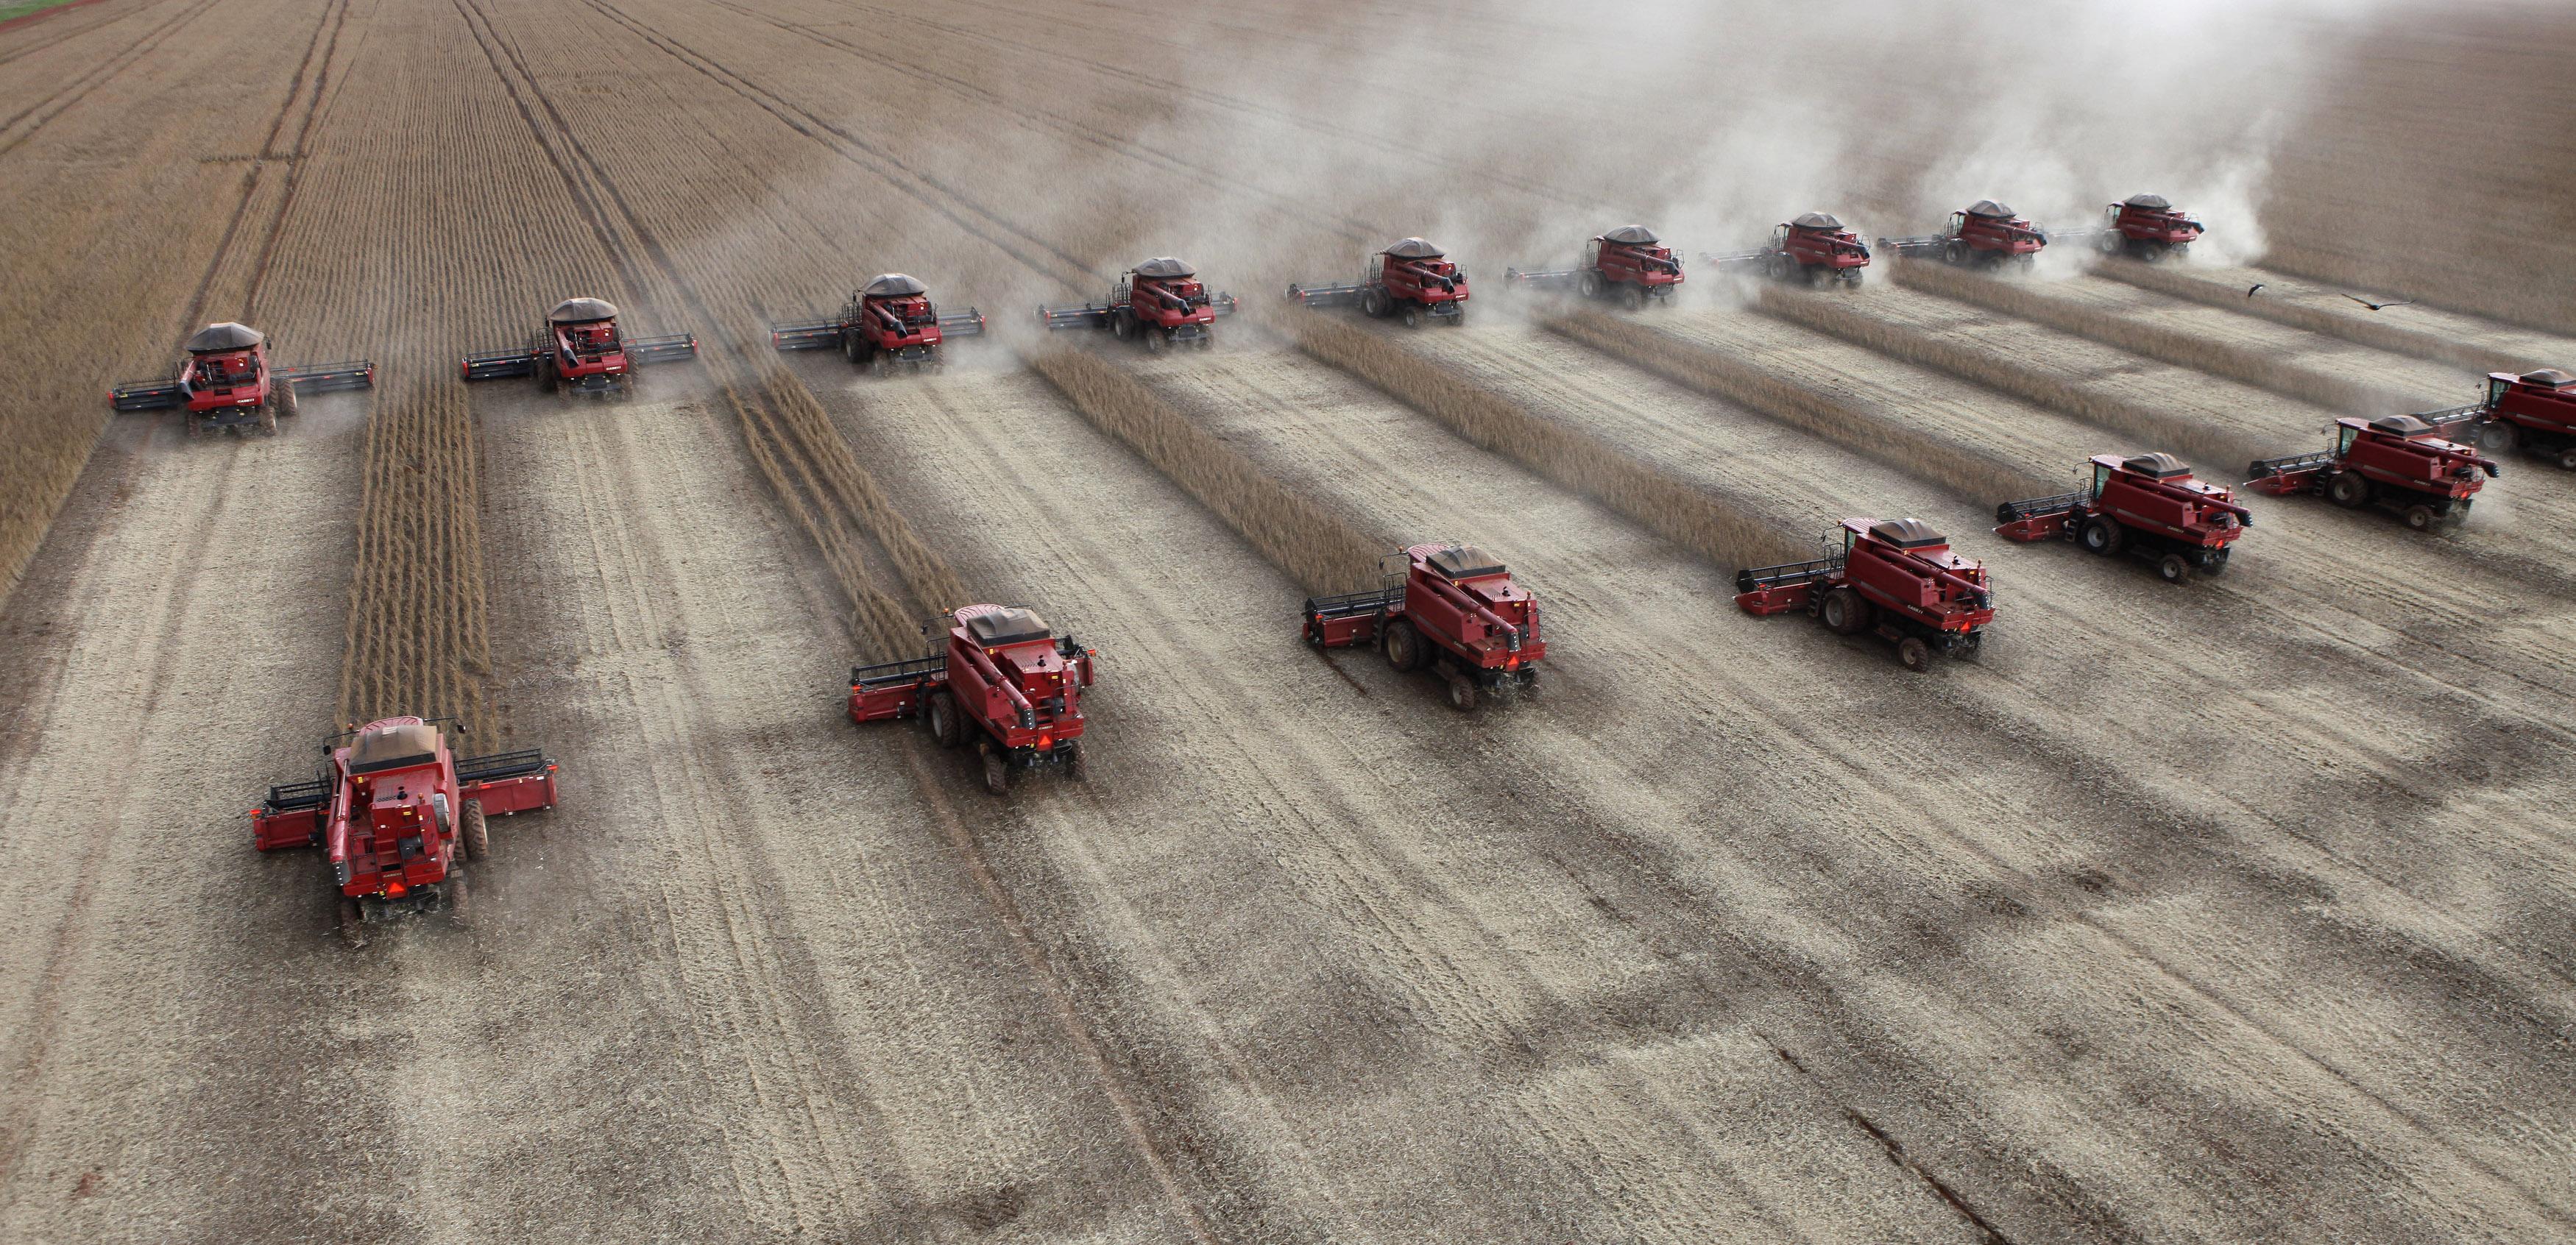 Workers harvest soybeans in a farm in Tangara da Serra in Cuiaba